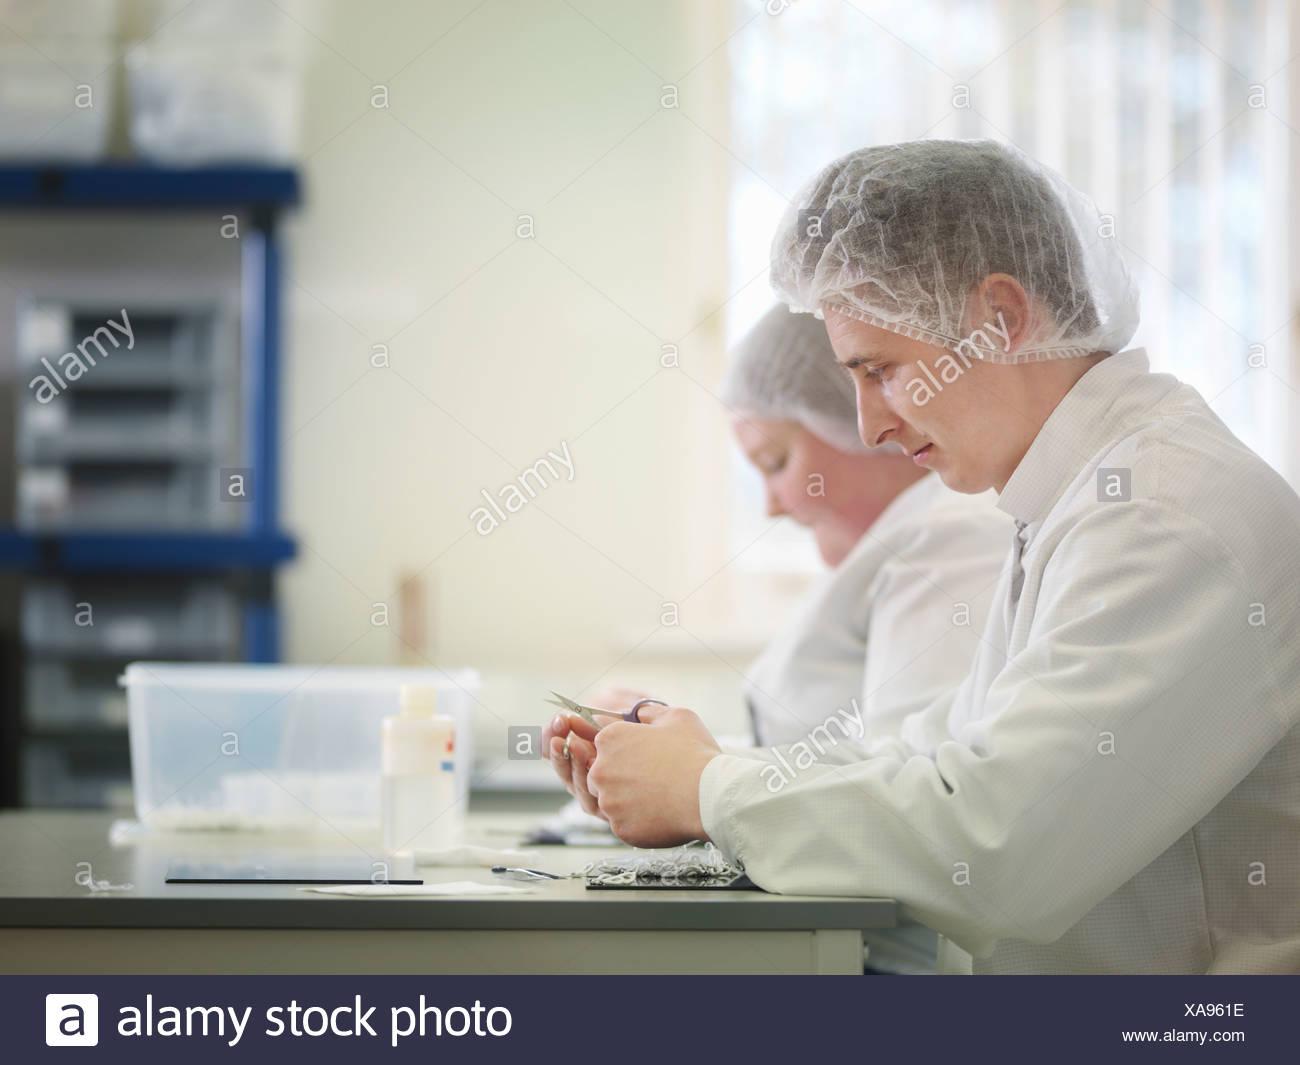 Laboratory Technician Production Line - Stock Image